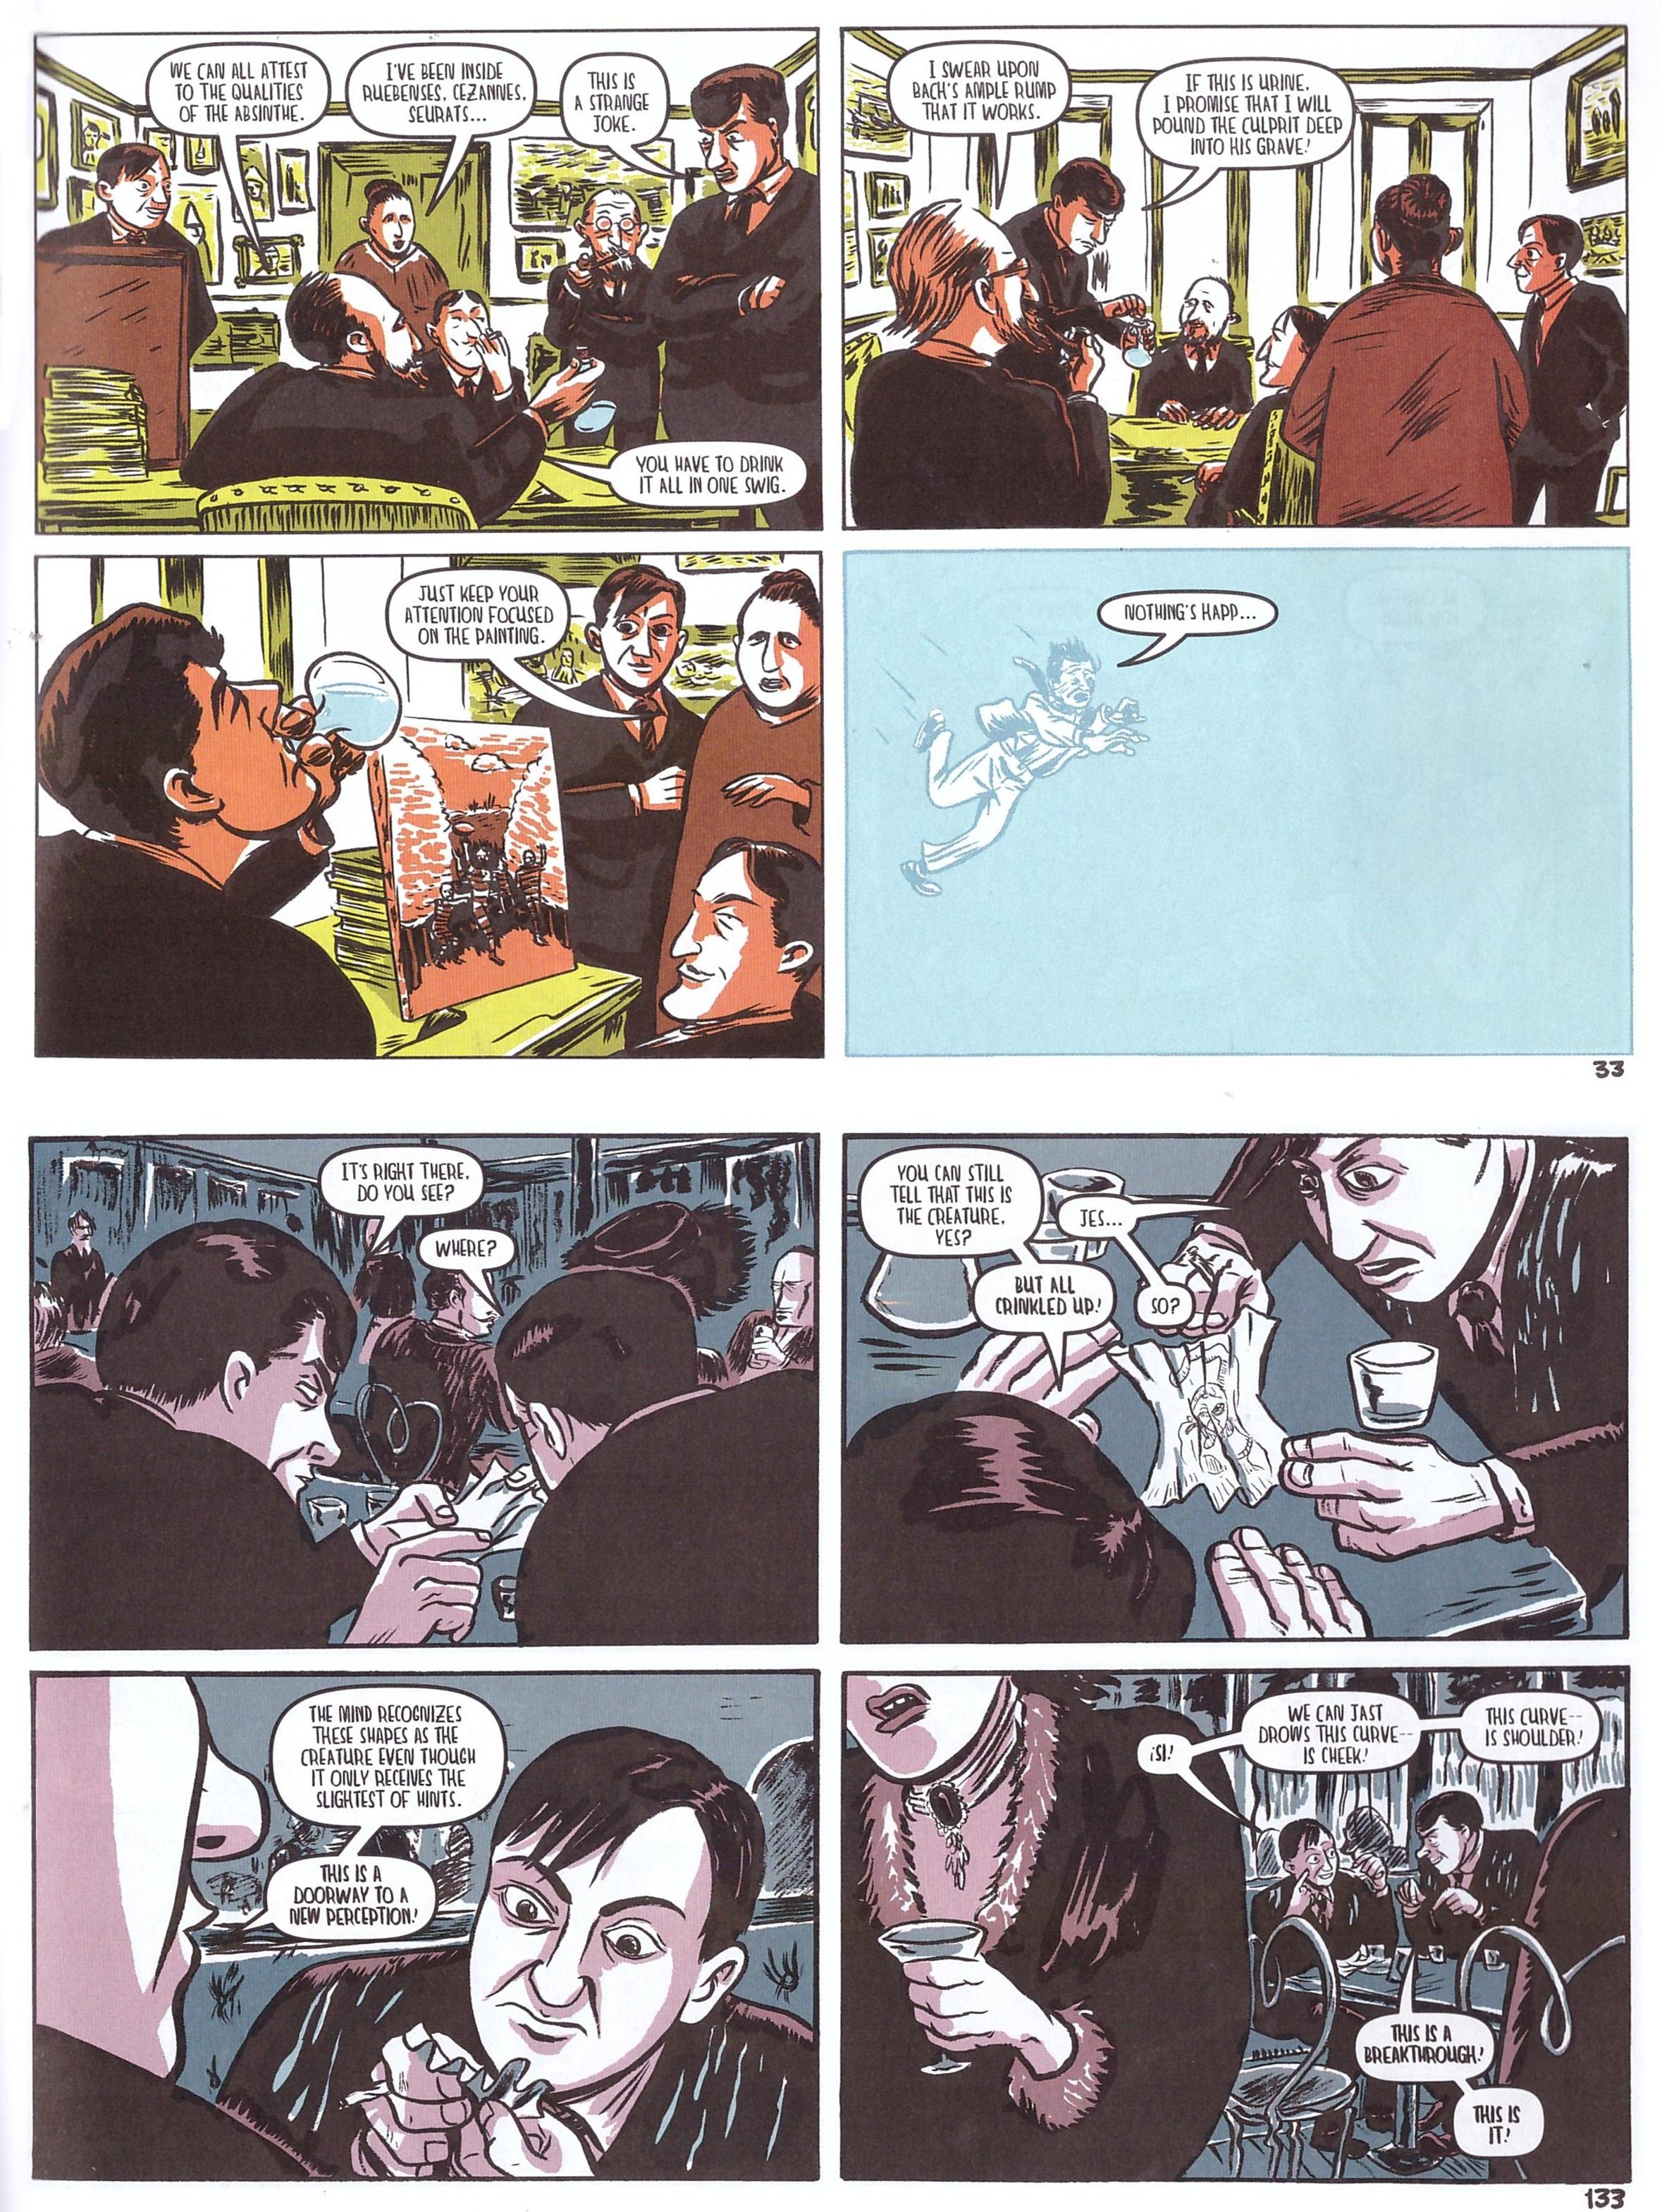 The Salon graphic novel review